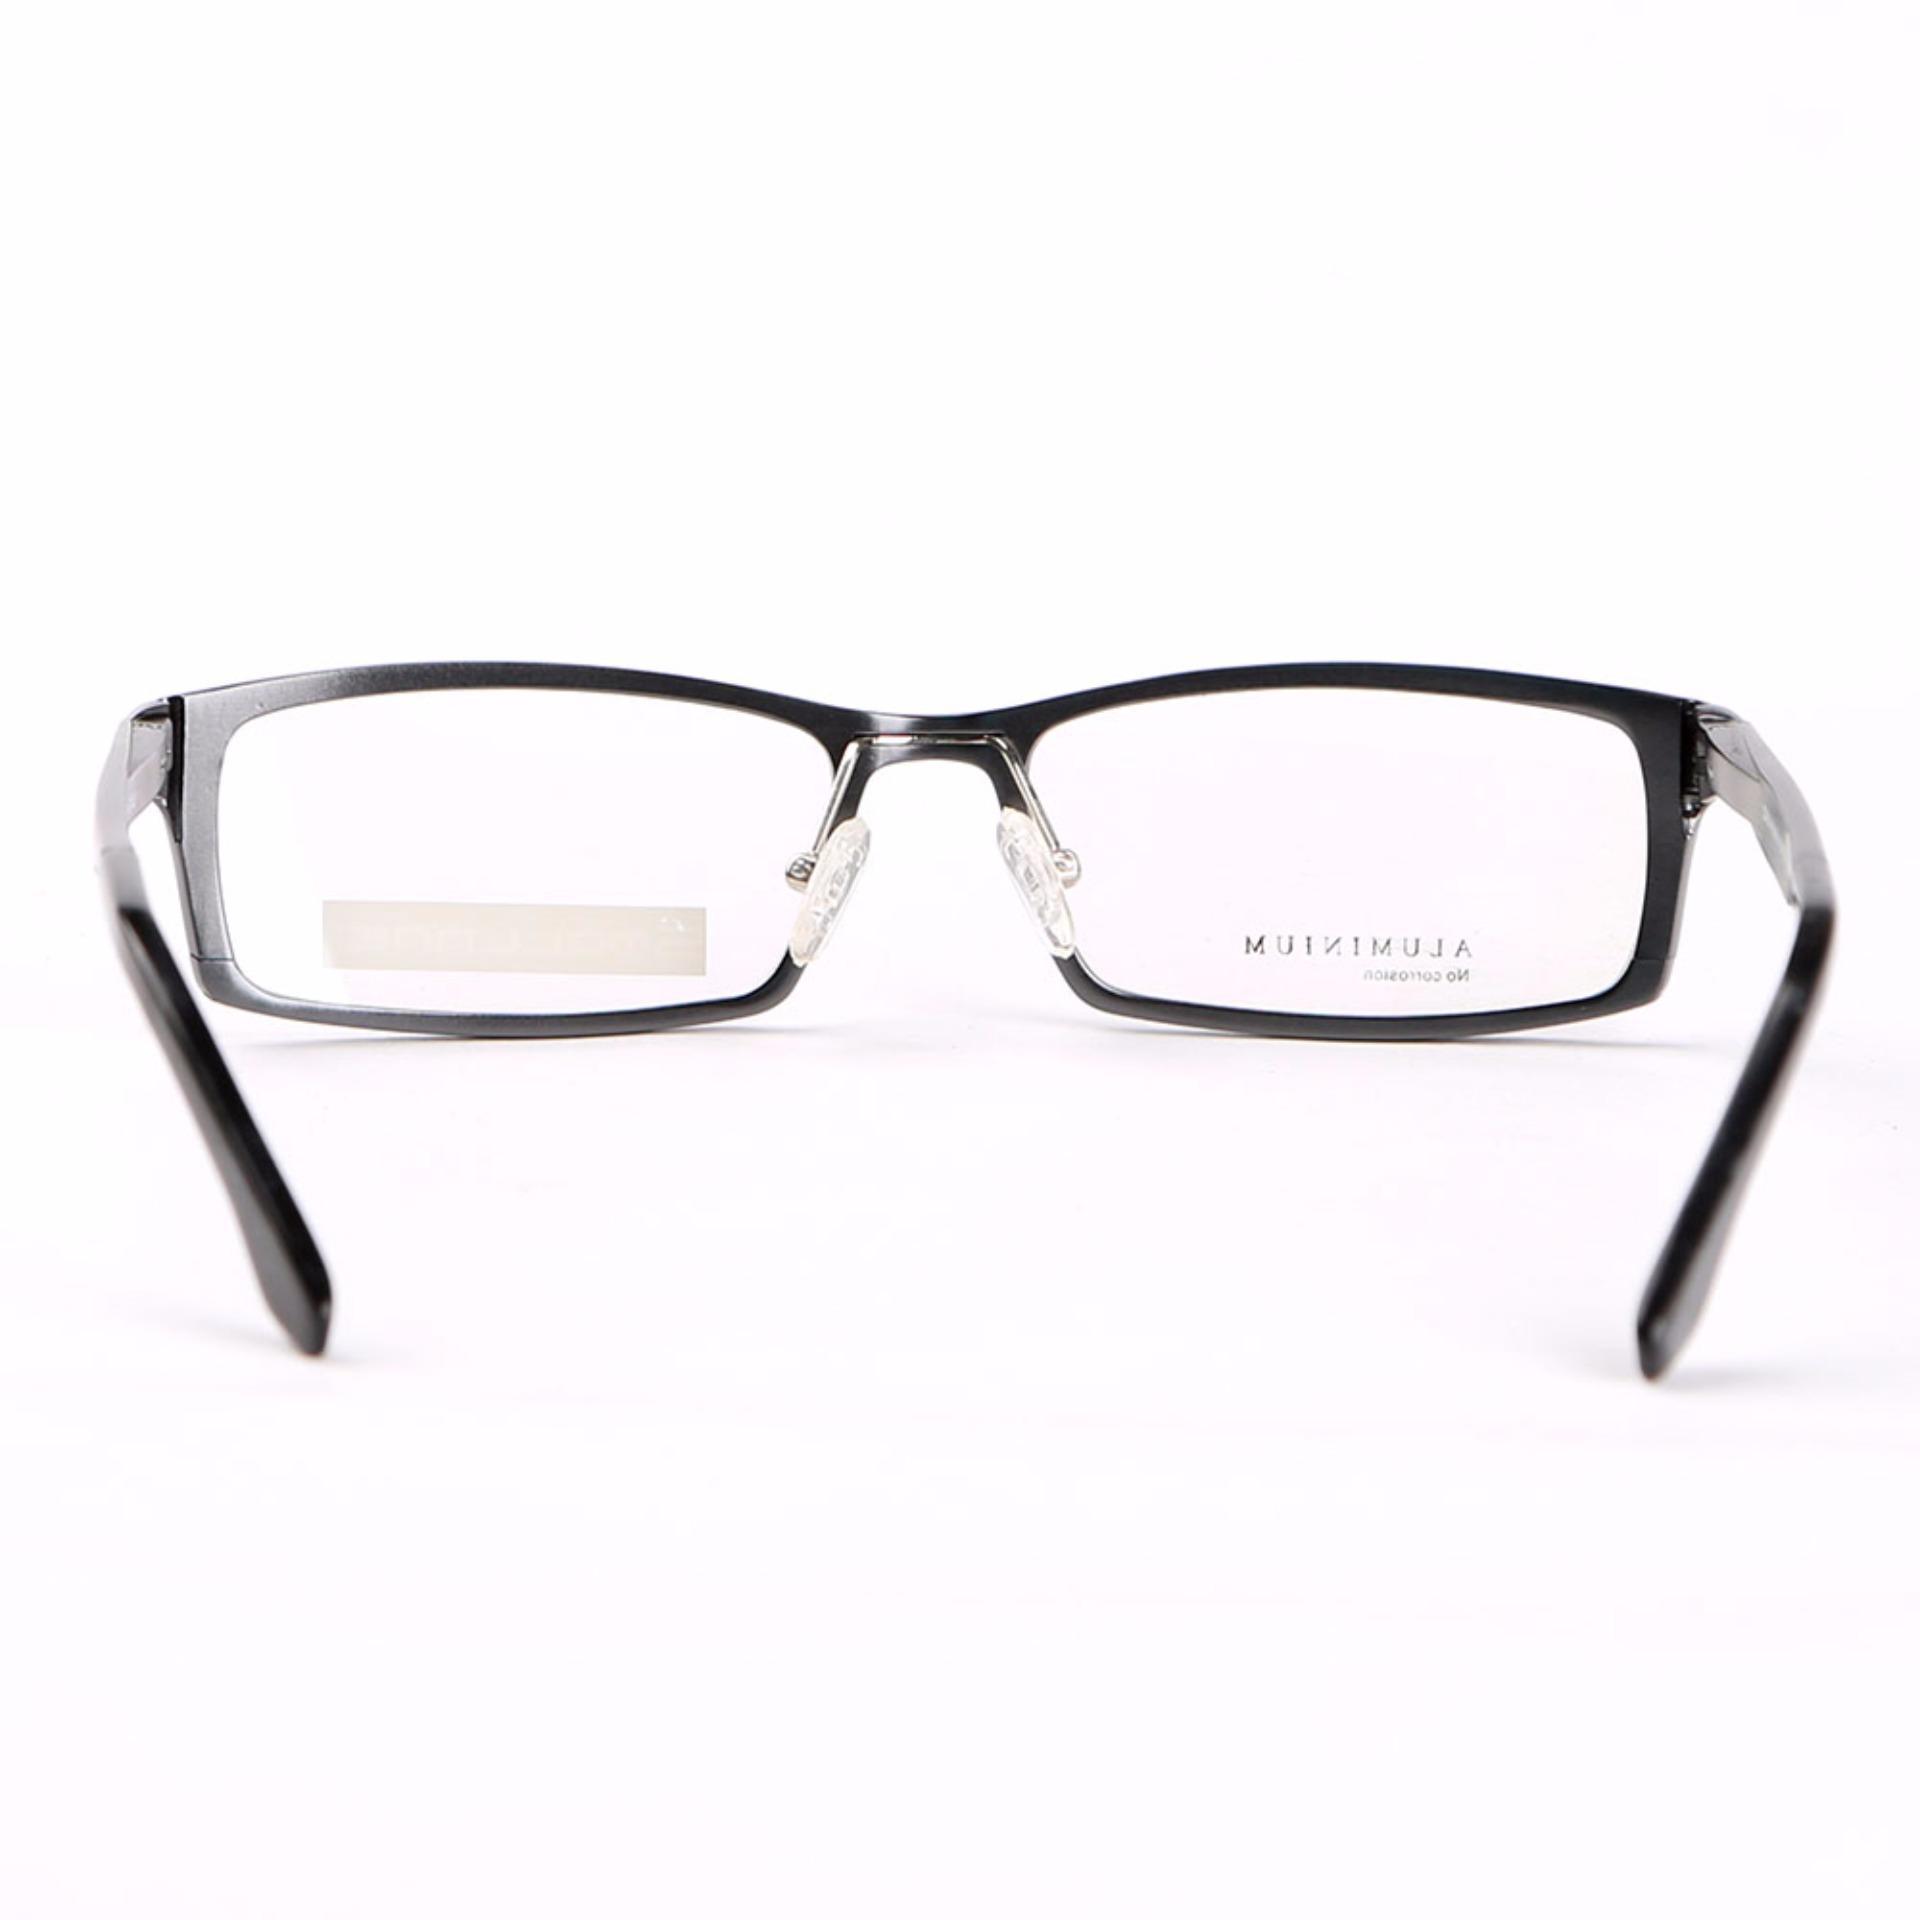 ... Stallane Fashion Optik Kacamata Bingkai Kacamata Frame Aluminium Miopia Bisnis Kacamata Frame Kacamata Yang Kokoh Untuk